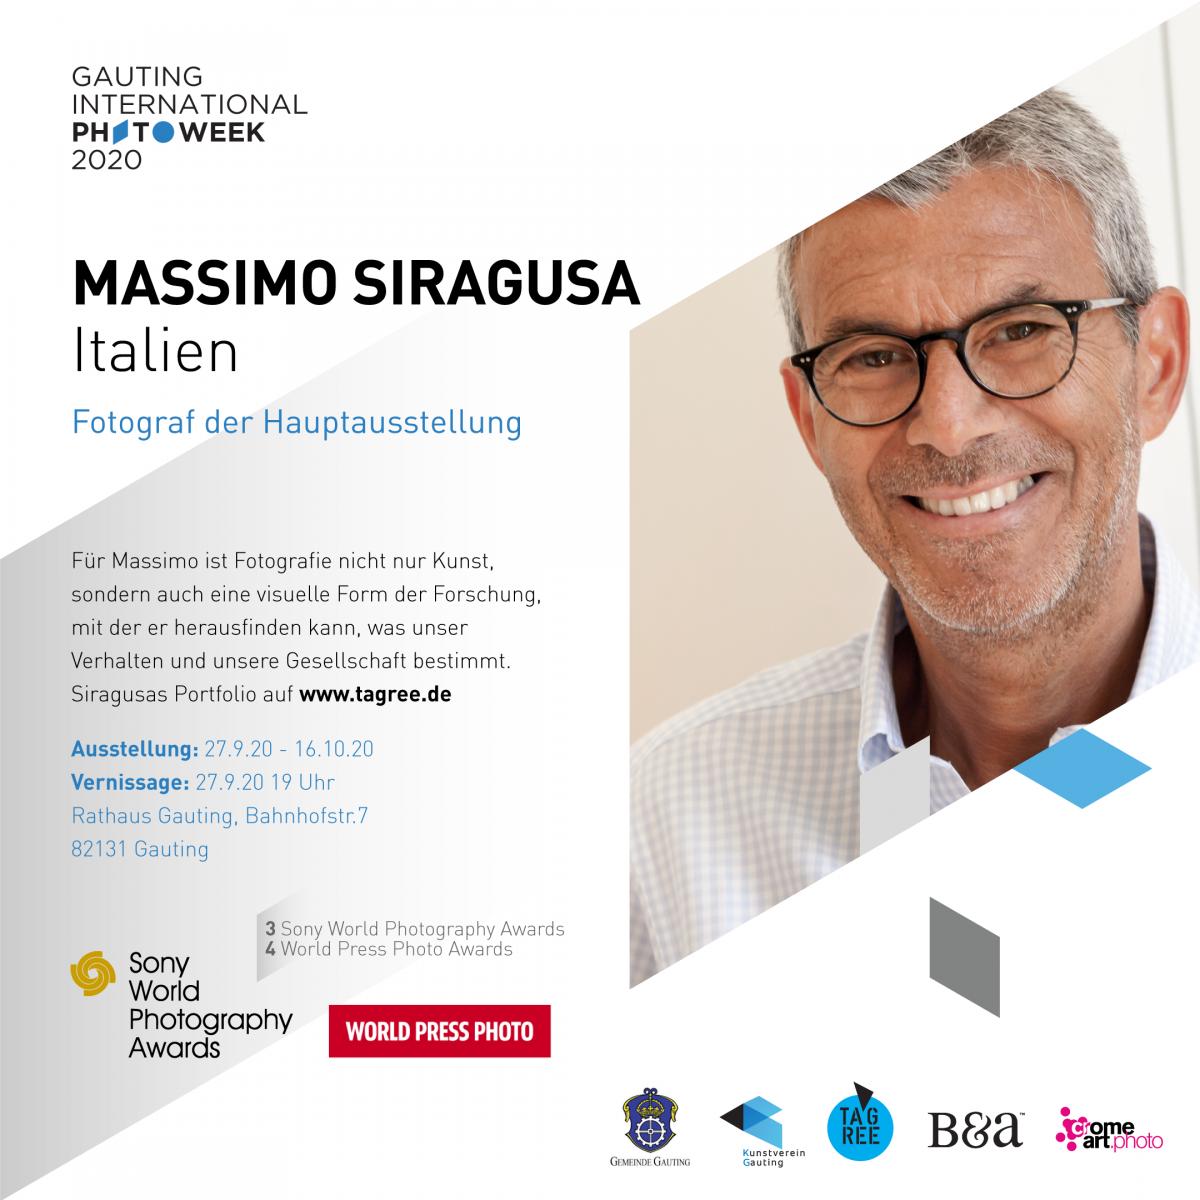 Massimo Siragusa / Italien